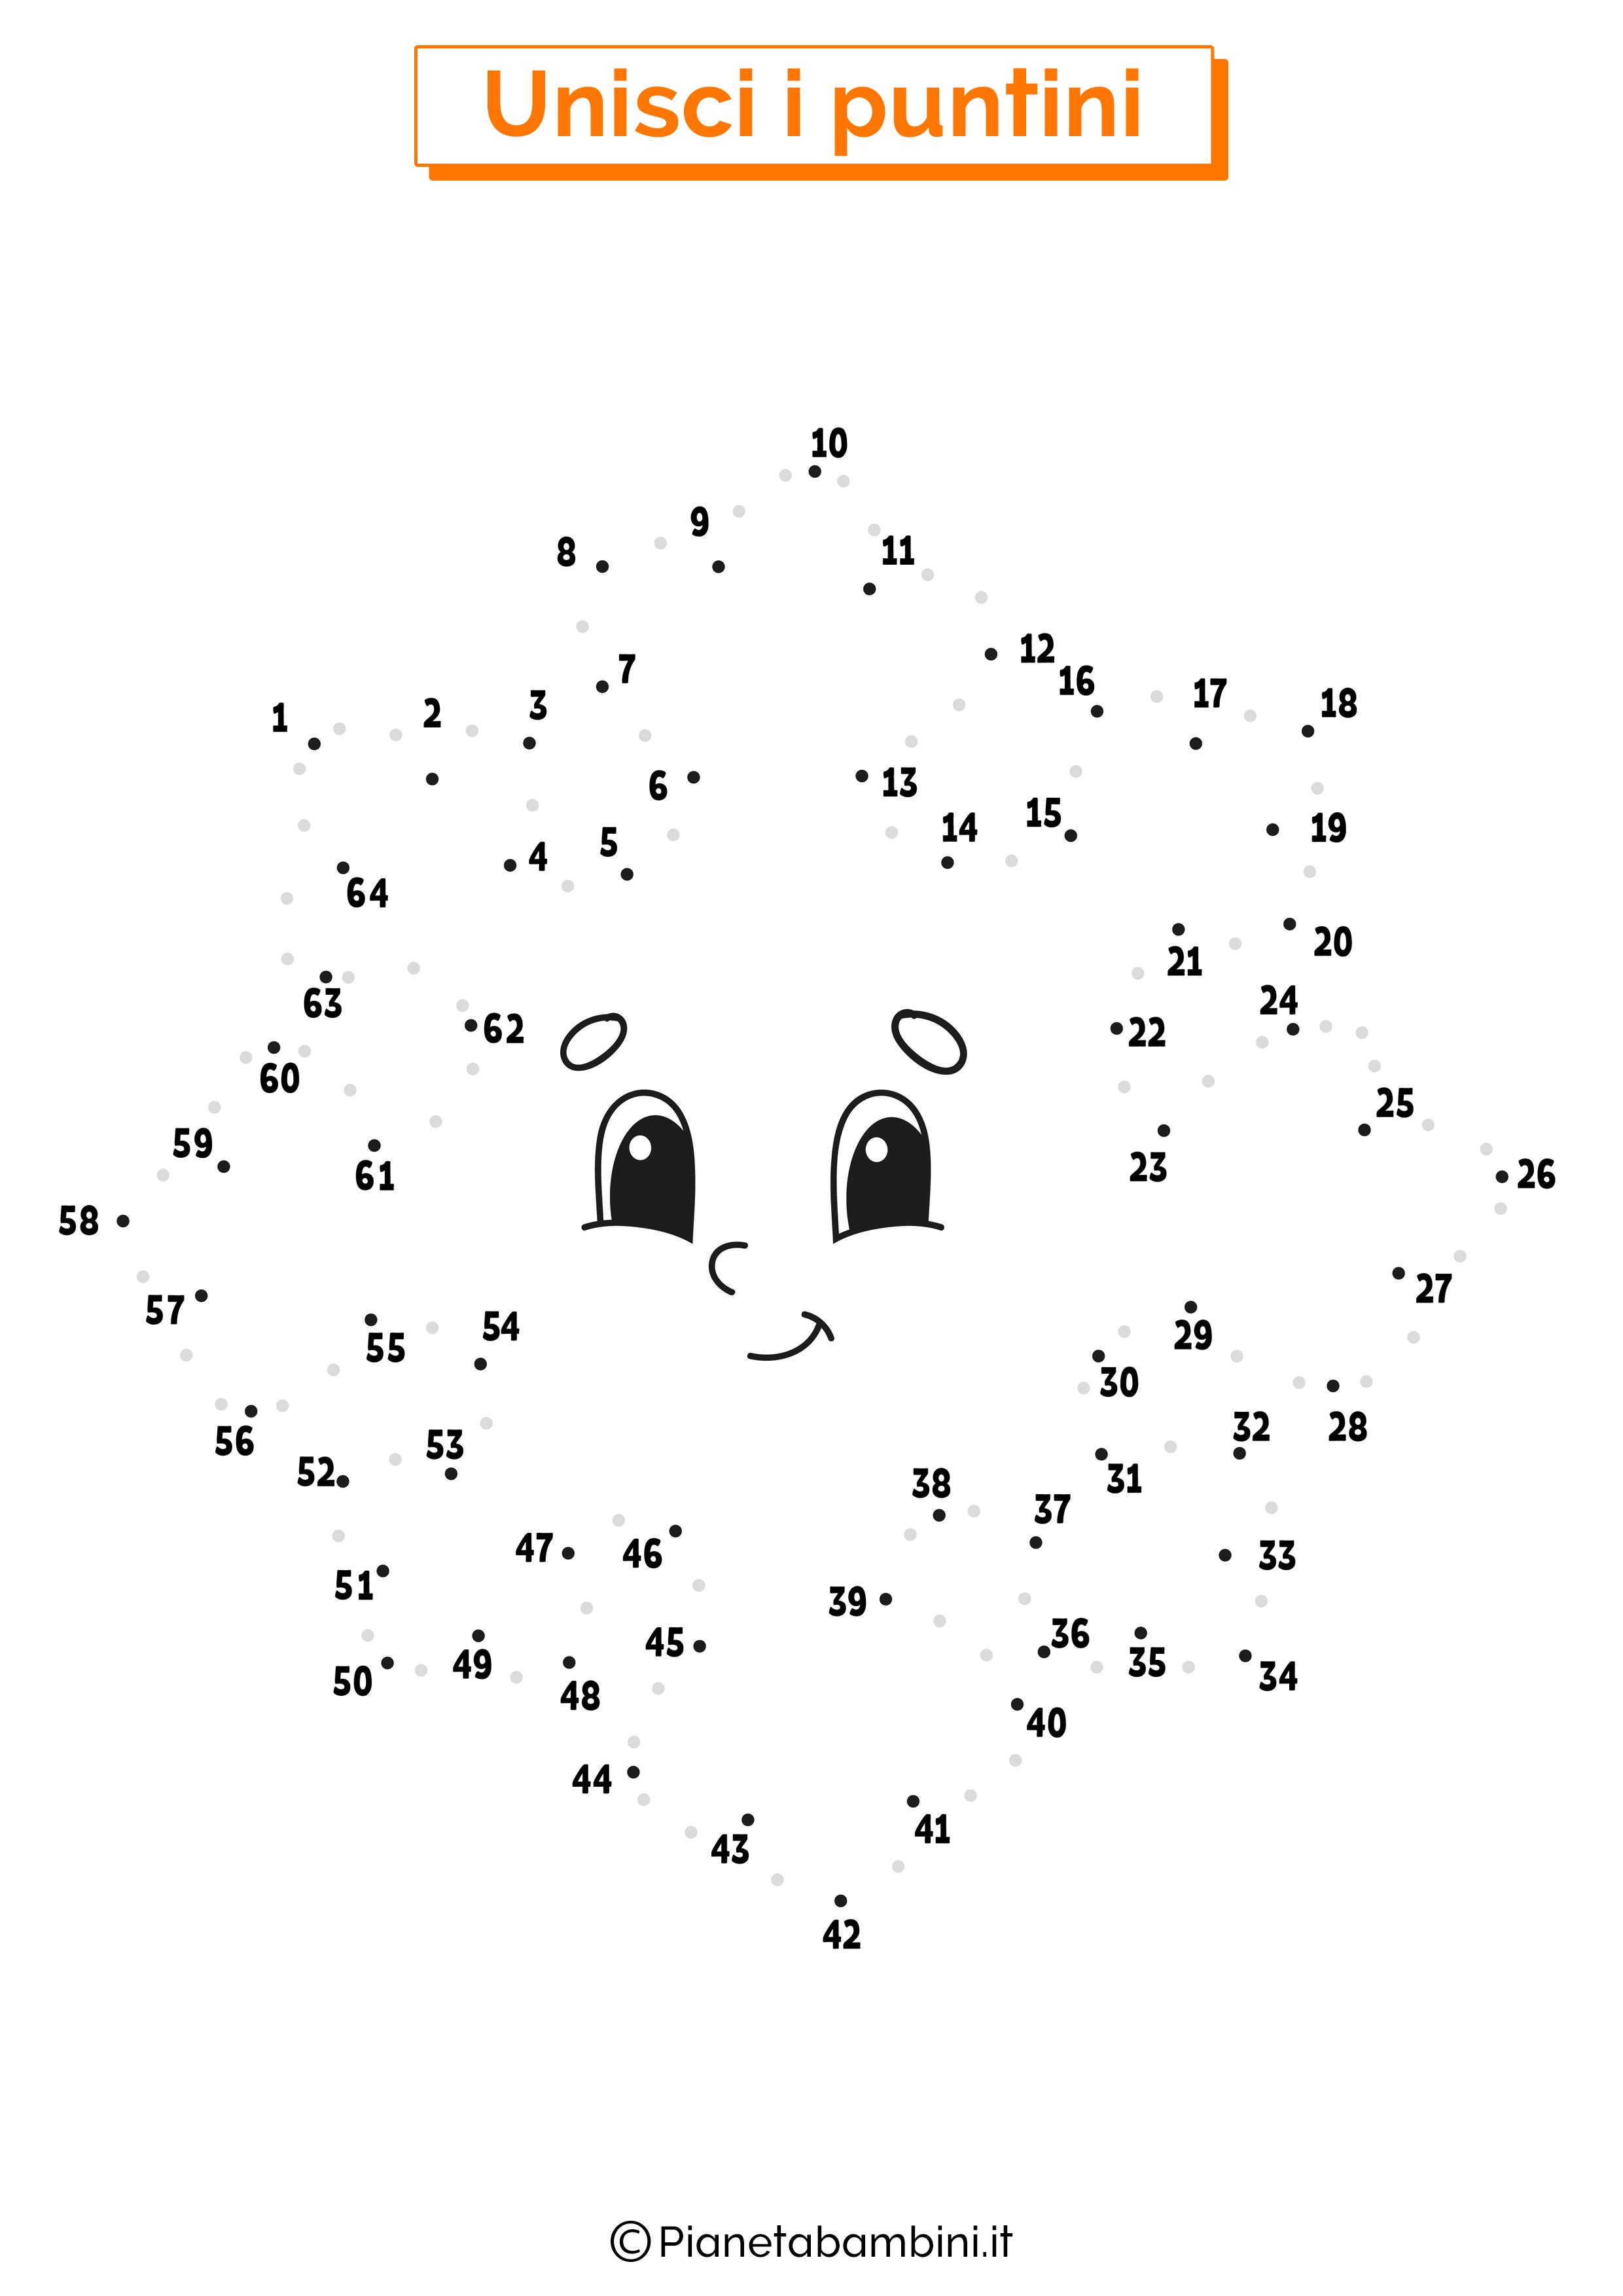 Disegno unisci i puntini da 1 a 50 fiocco di neve